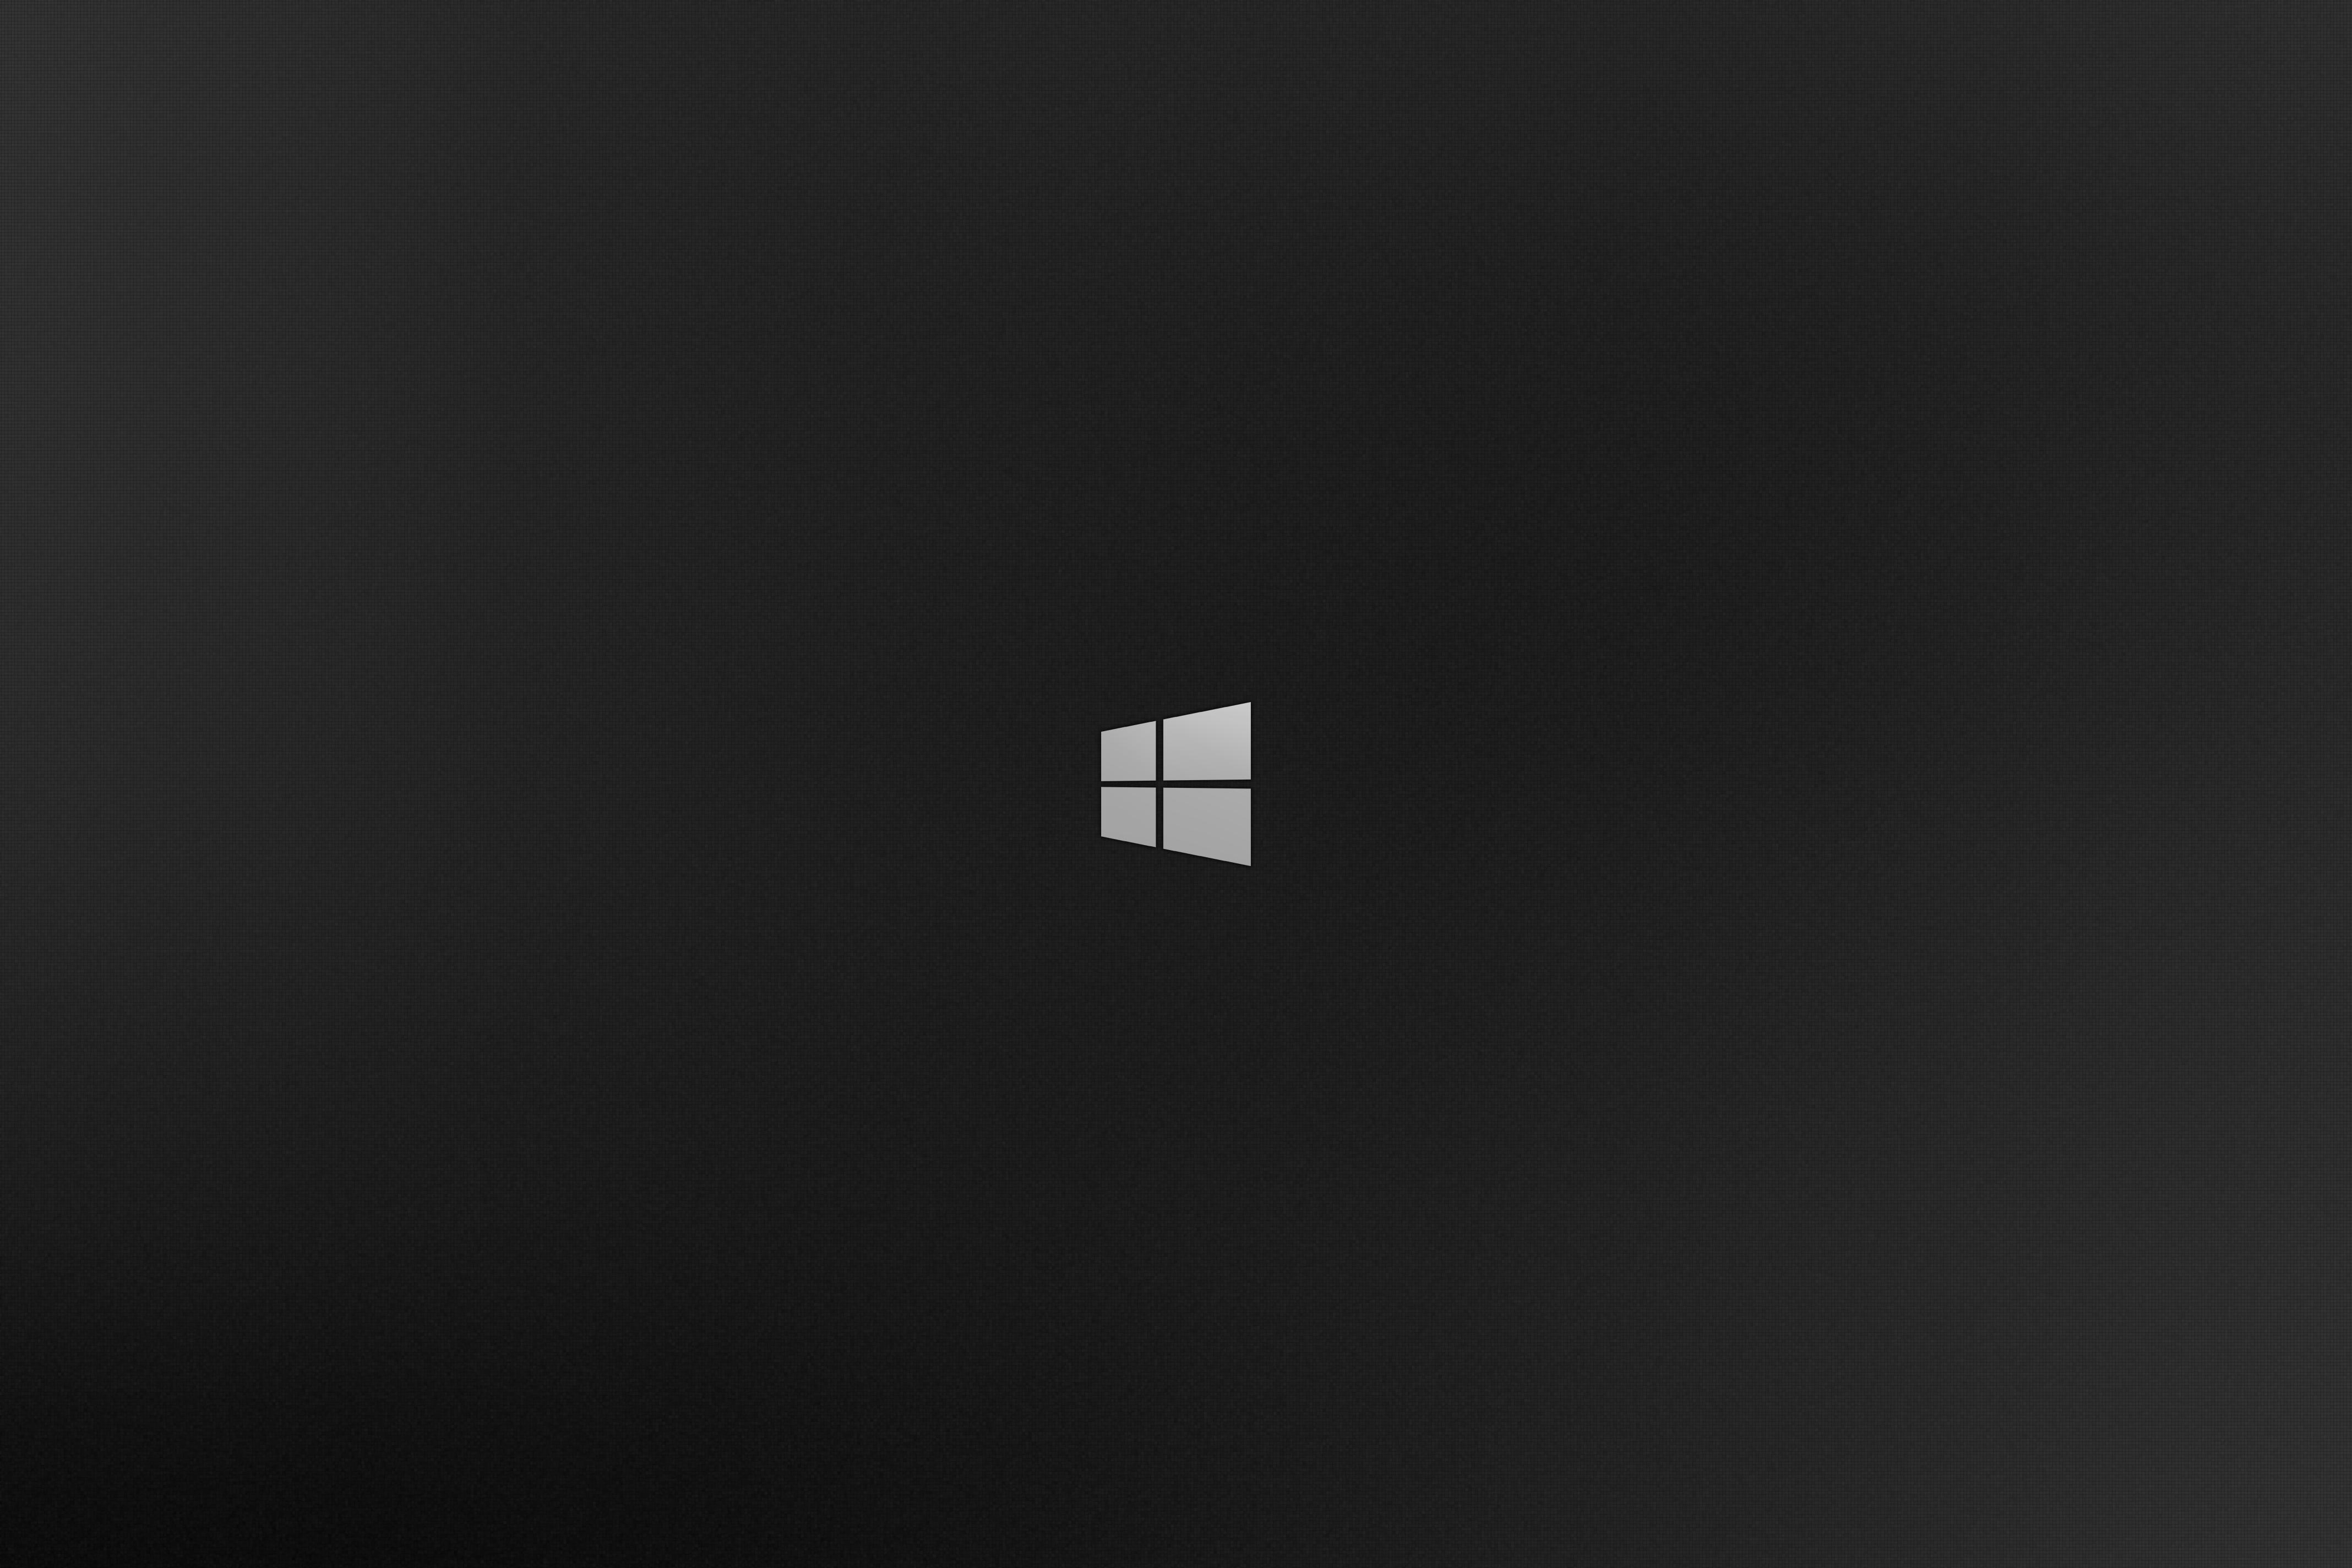 Windows Black Wallpaper